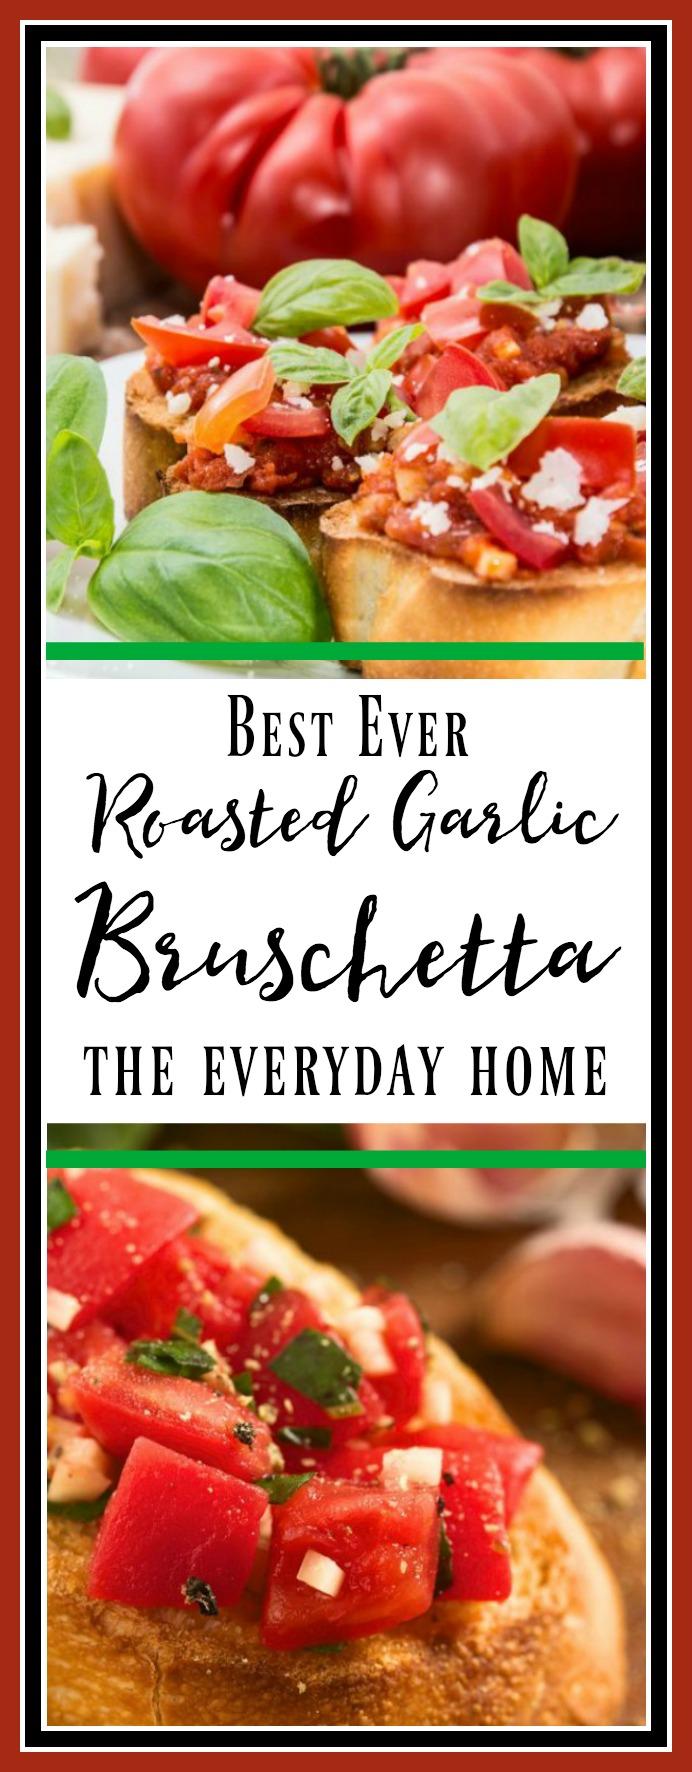 Best EVER Roasted Garlic Bruschetta Recipe | The Everyday Home | www.everydayhomeblog.com